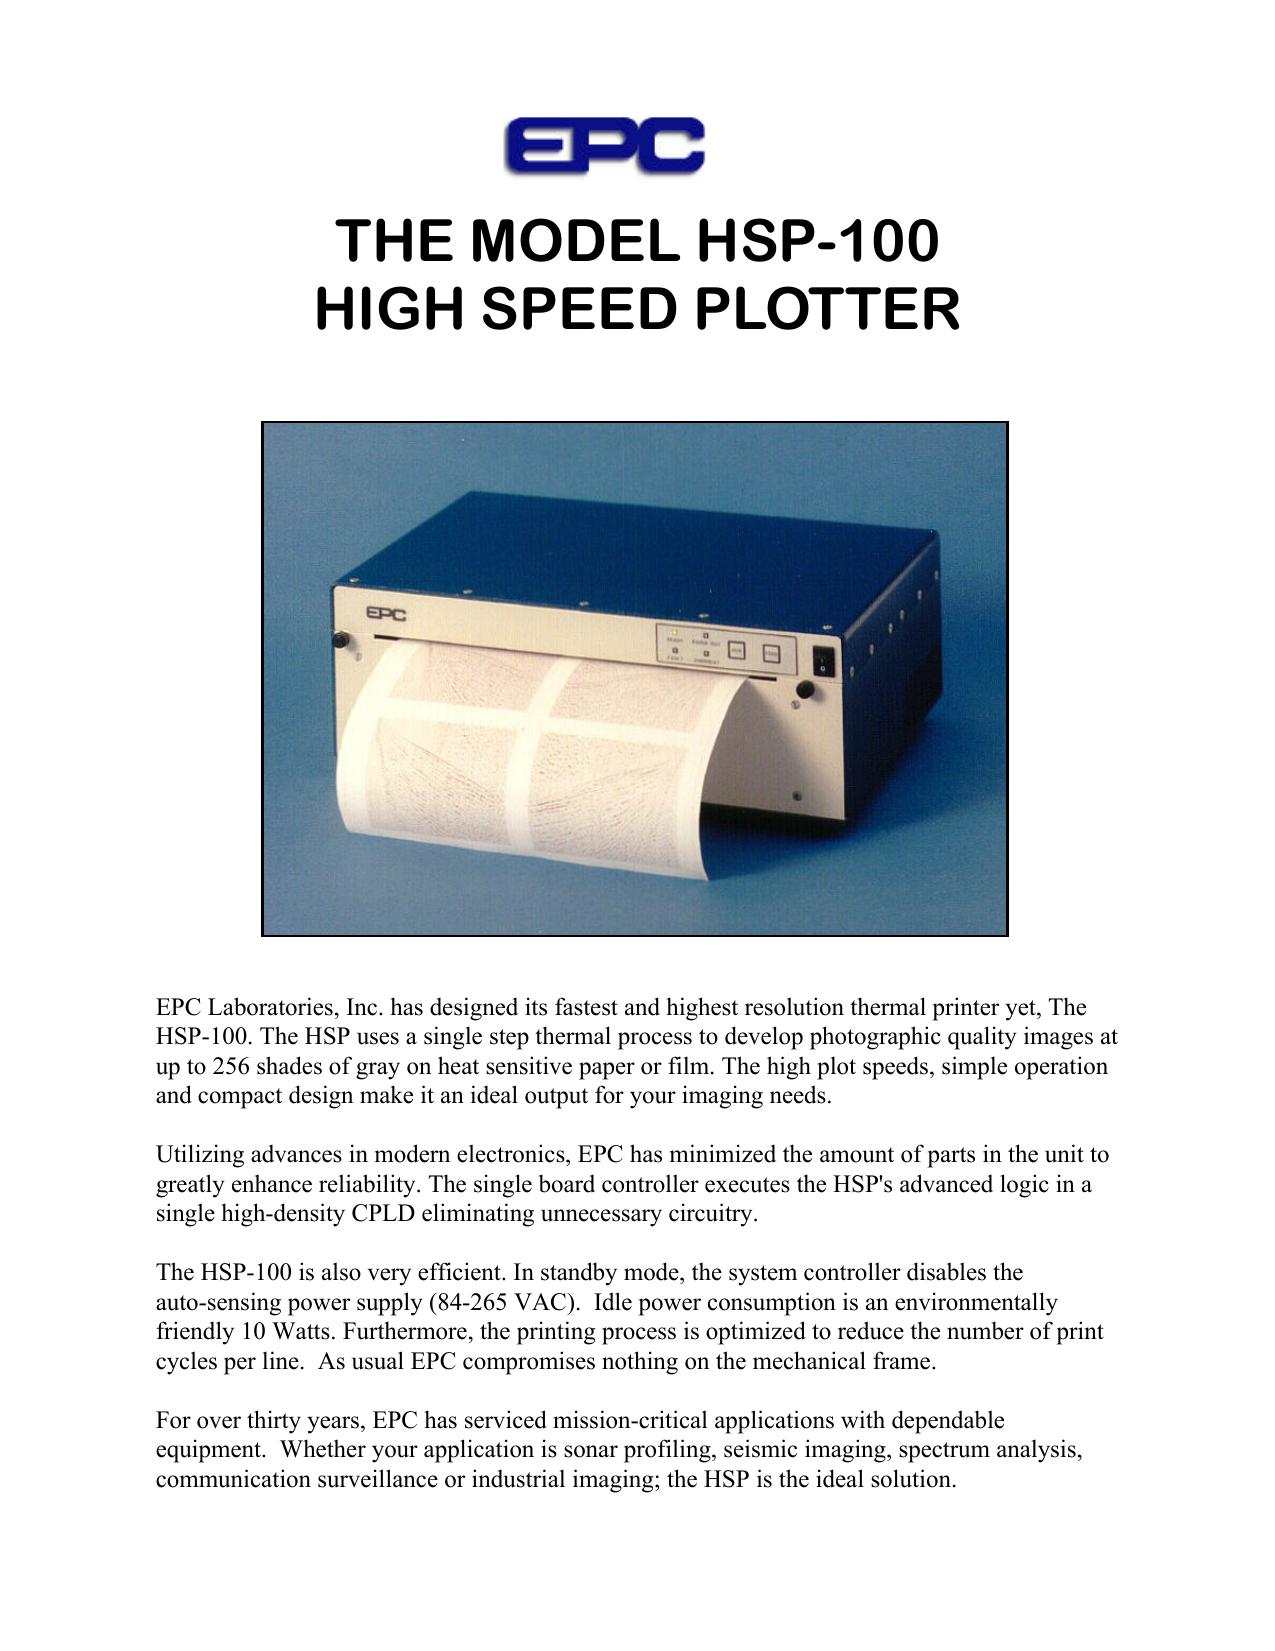 THE MODEL HSP-100 HIGH SPEED PLOTTER   manualzz com